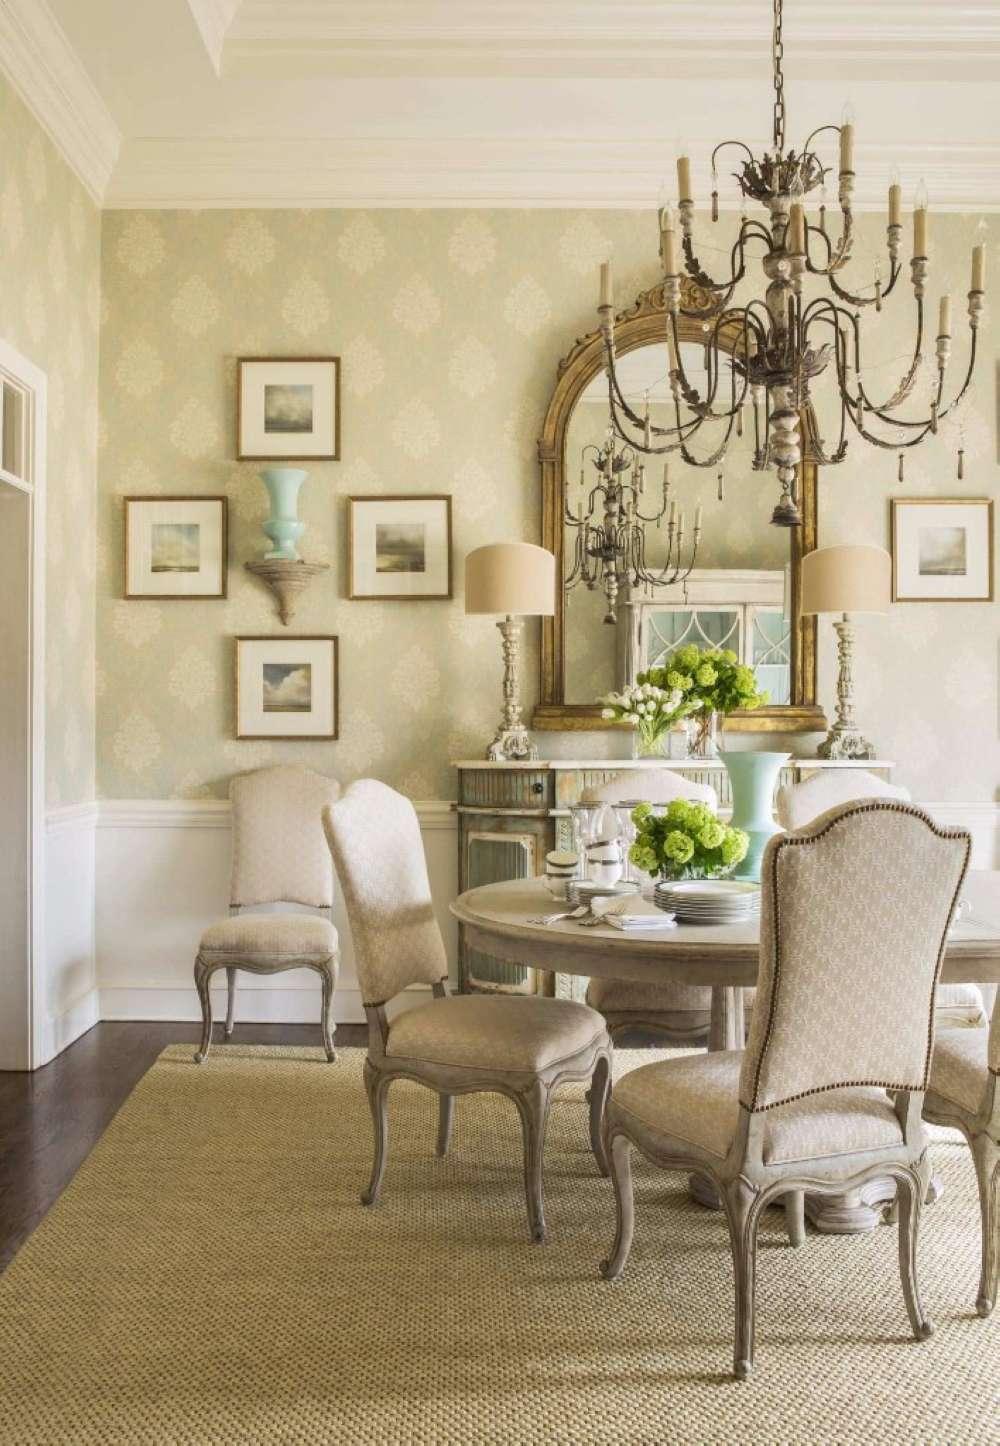 Arkansas-interior-design-Livable-Luxury-IMG_002